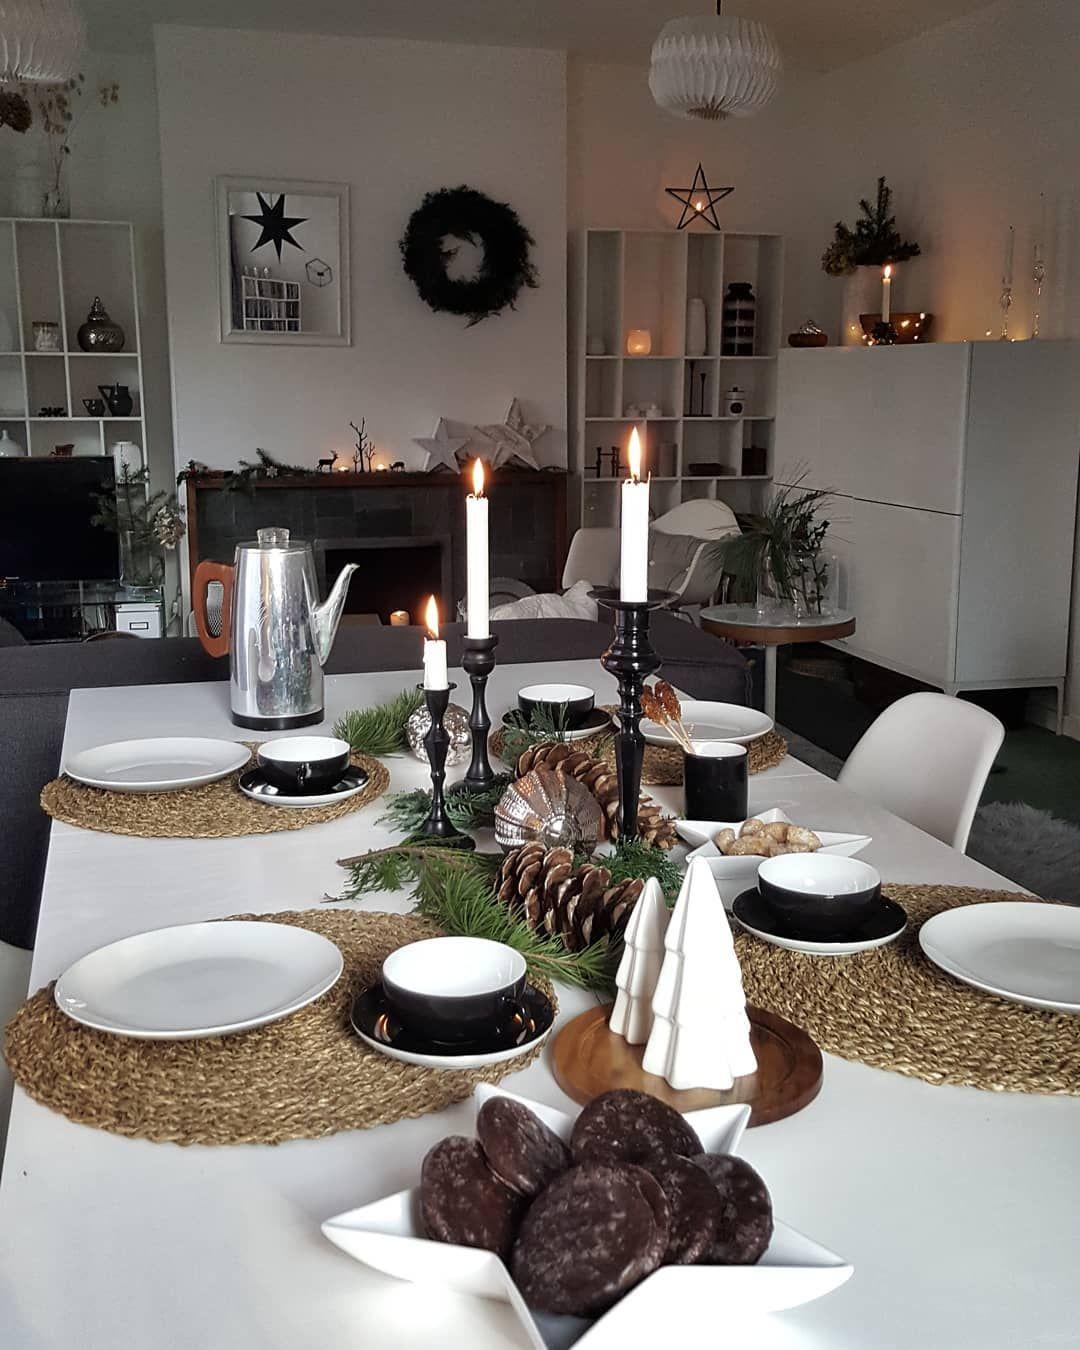 Using Fabrics To Dictate The Temperature Dining Room Inspo